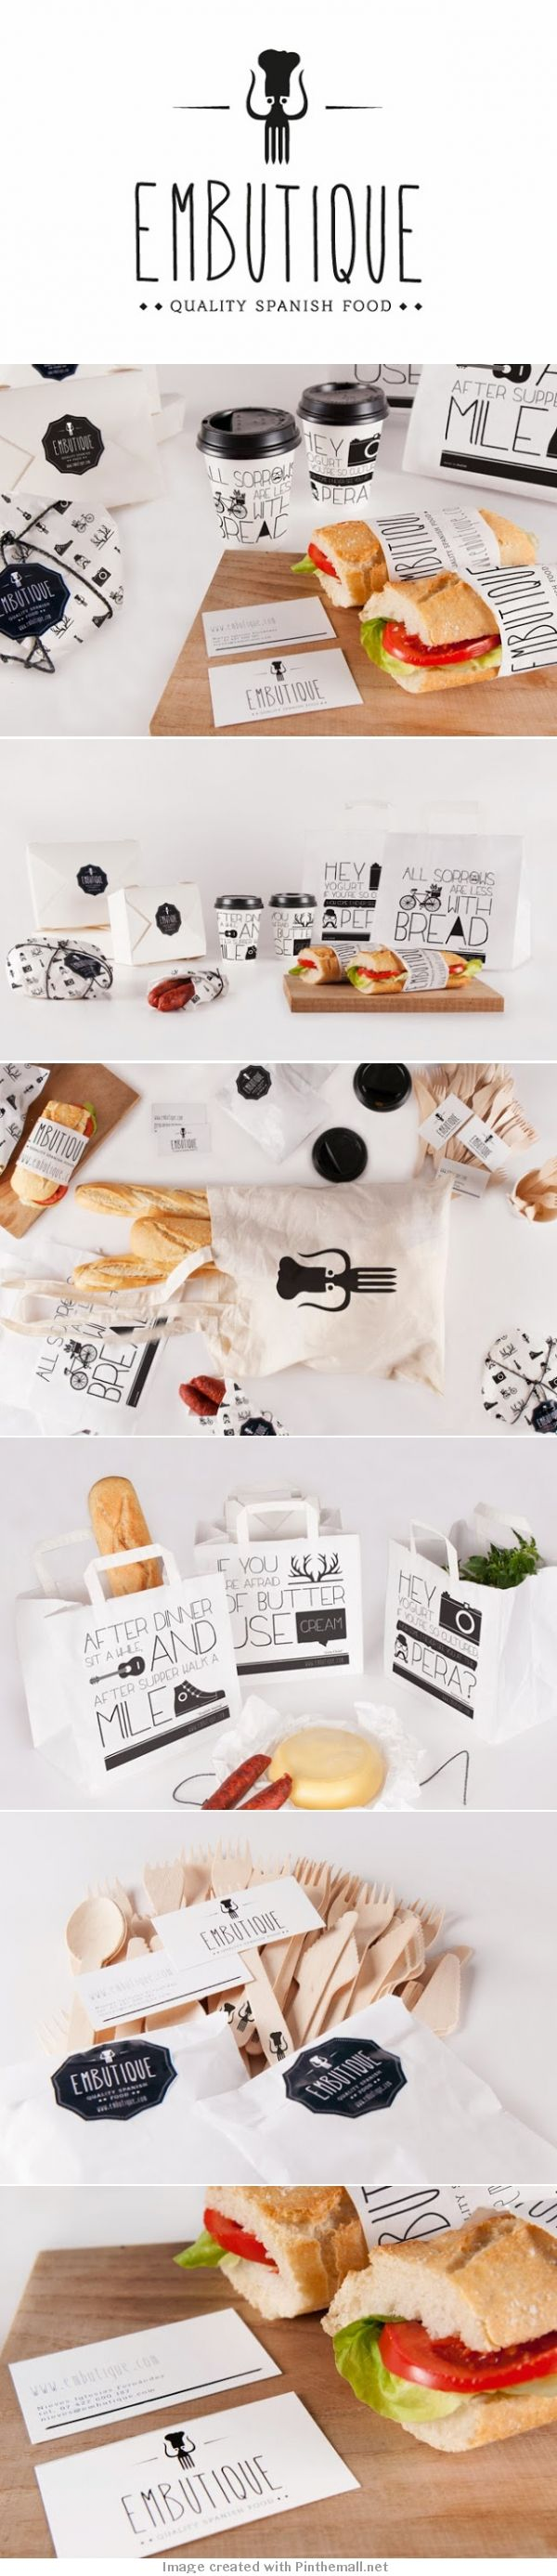 Unique Branding Design, Embutique #Branding #Design (http://www.pinterest.com/aldenchong/)